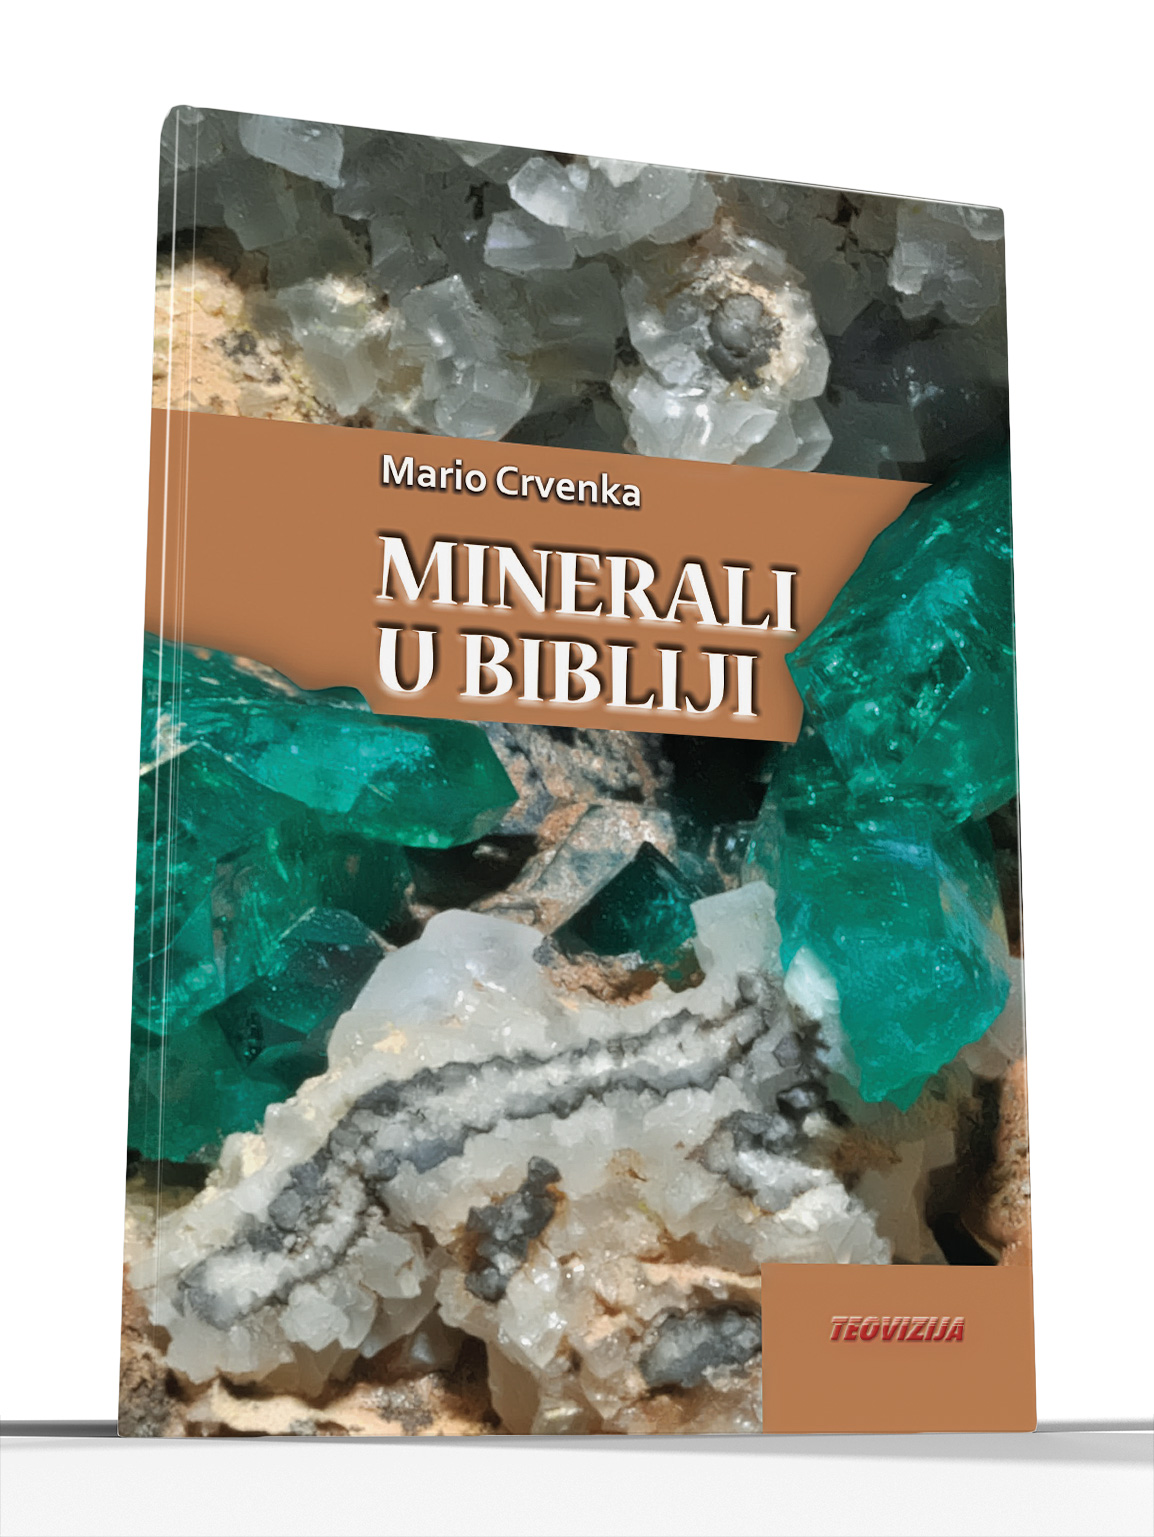 MINERALI U BIBLIJI - Mario Crvenka